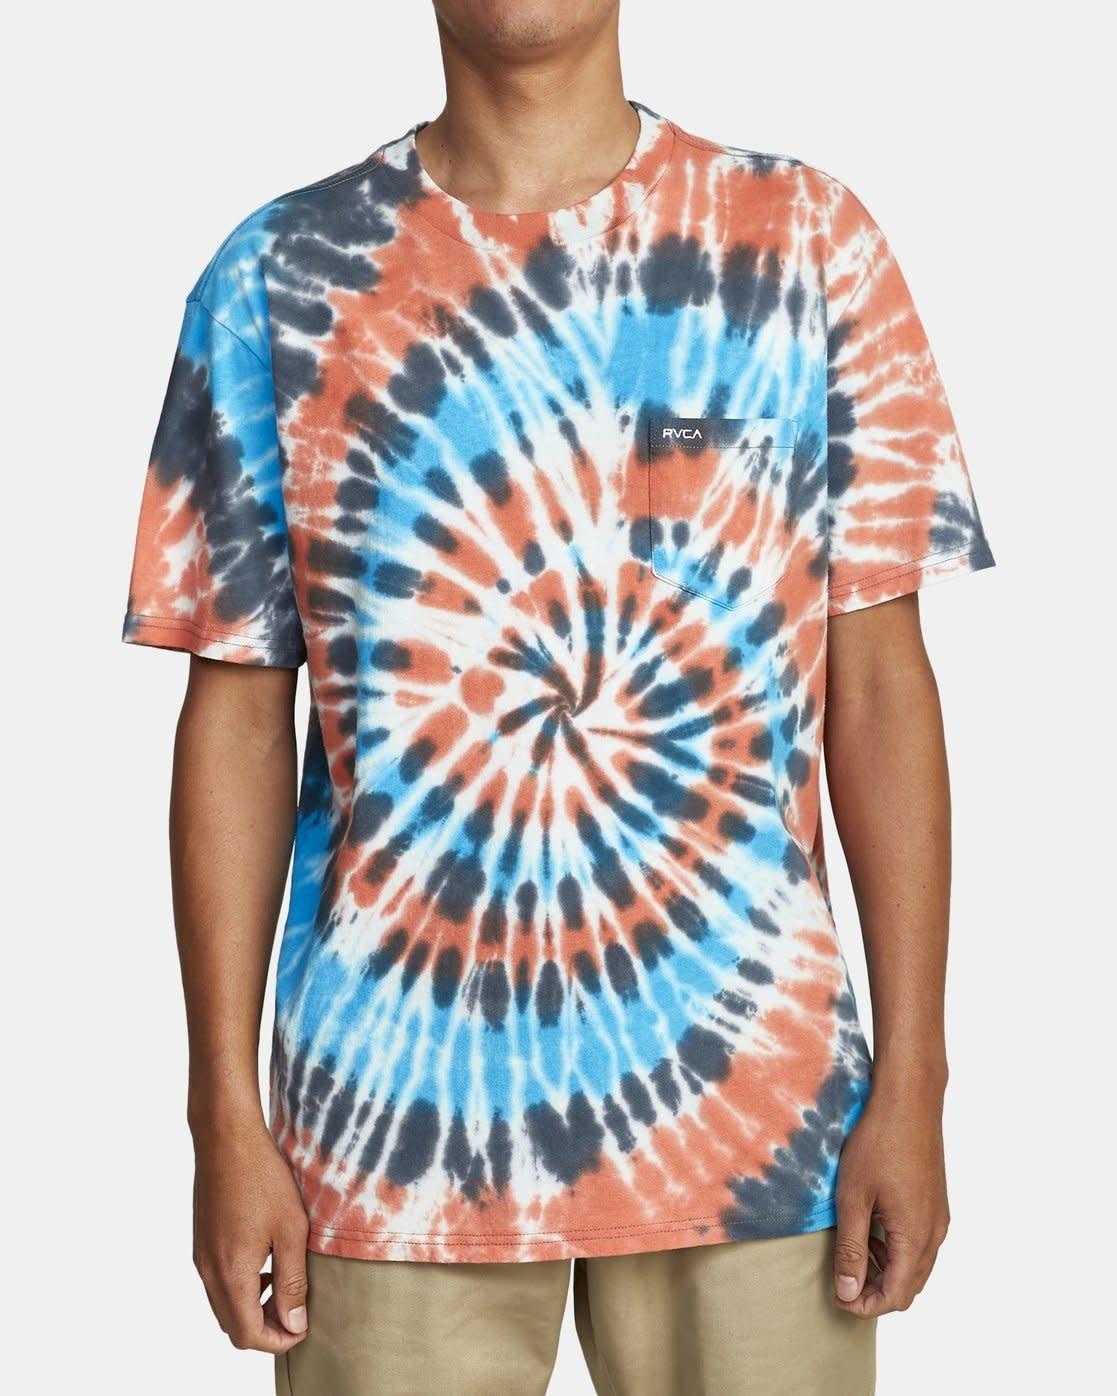 RVCA Dayshift Tie Dye T-Shirt-2